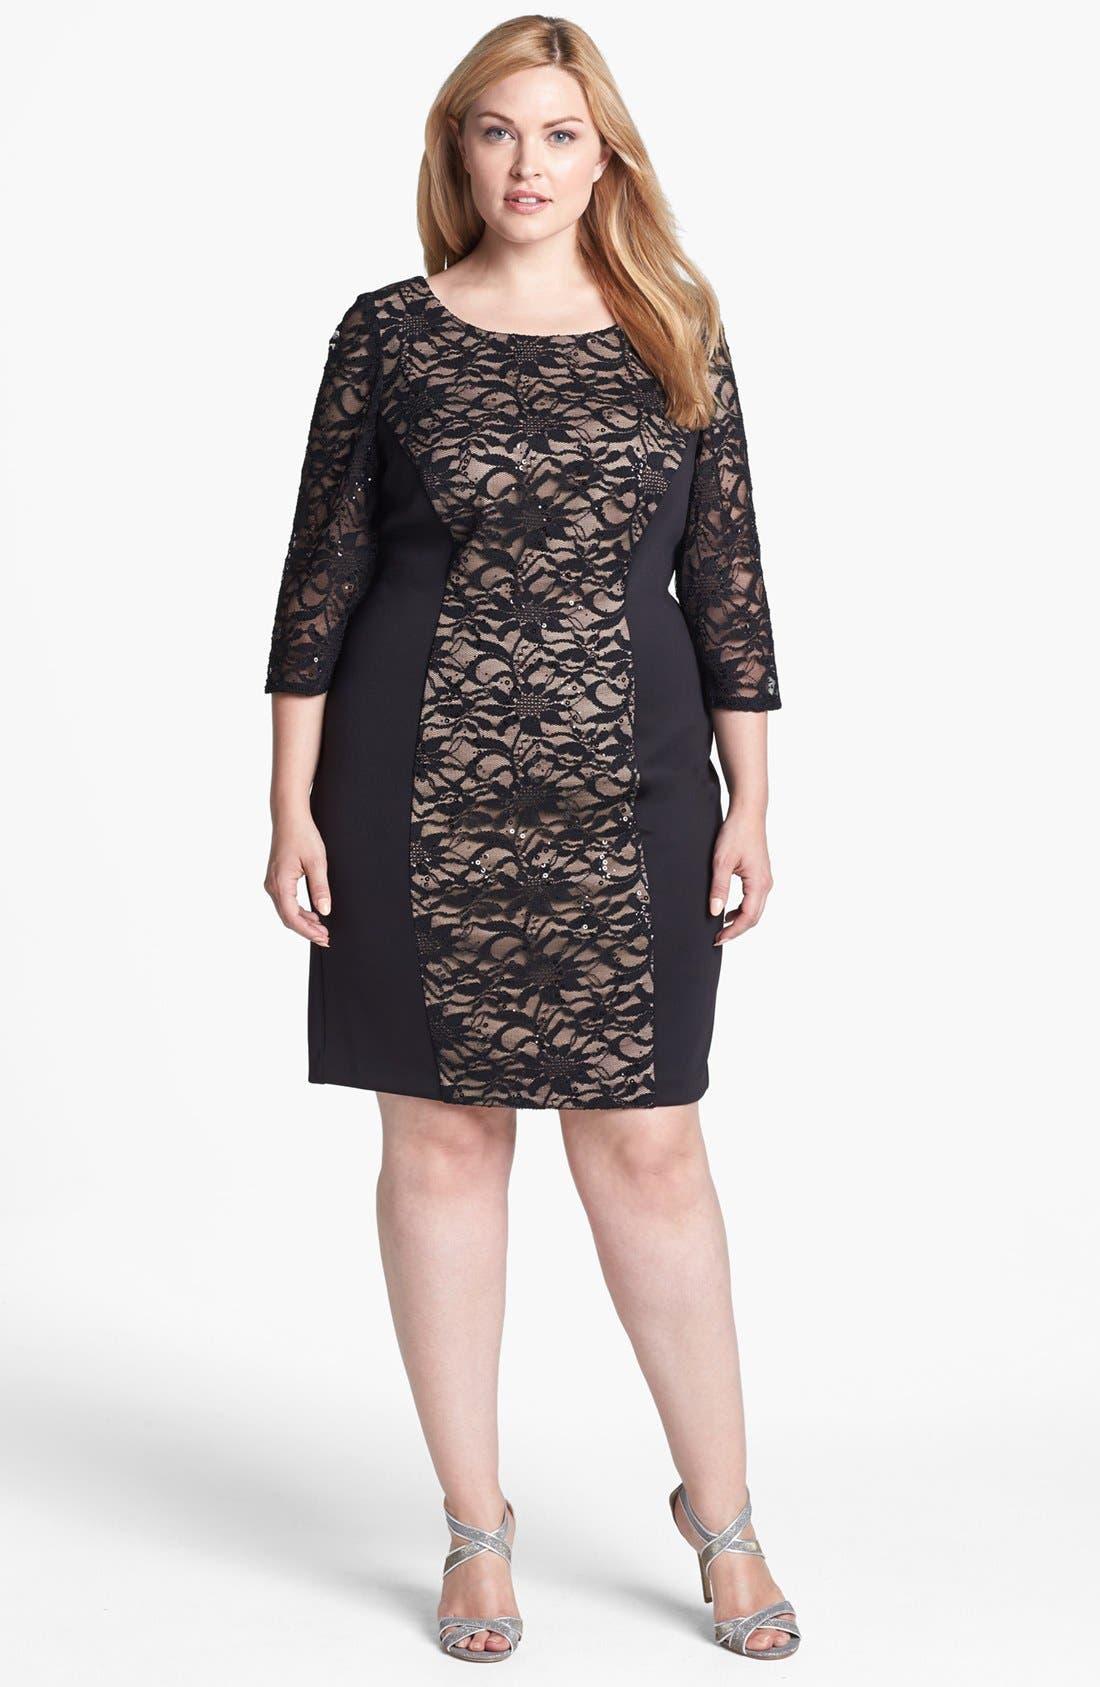 Alternate Image 1 Selected - Alex Evenings Embellished Lace Panel Sheath Dress (Plus Size)